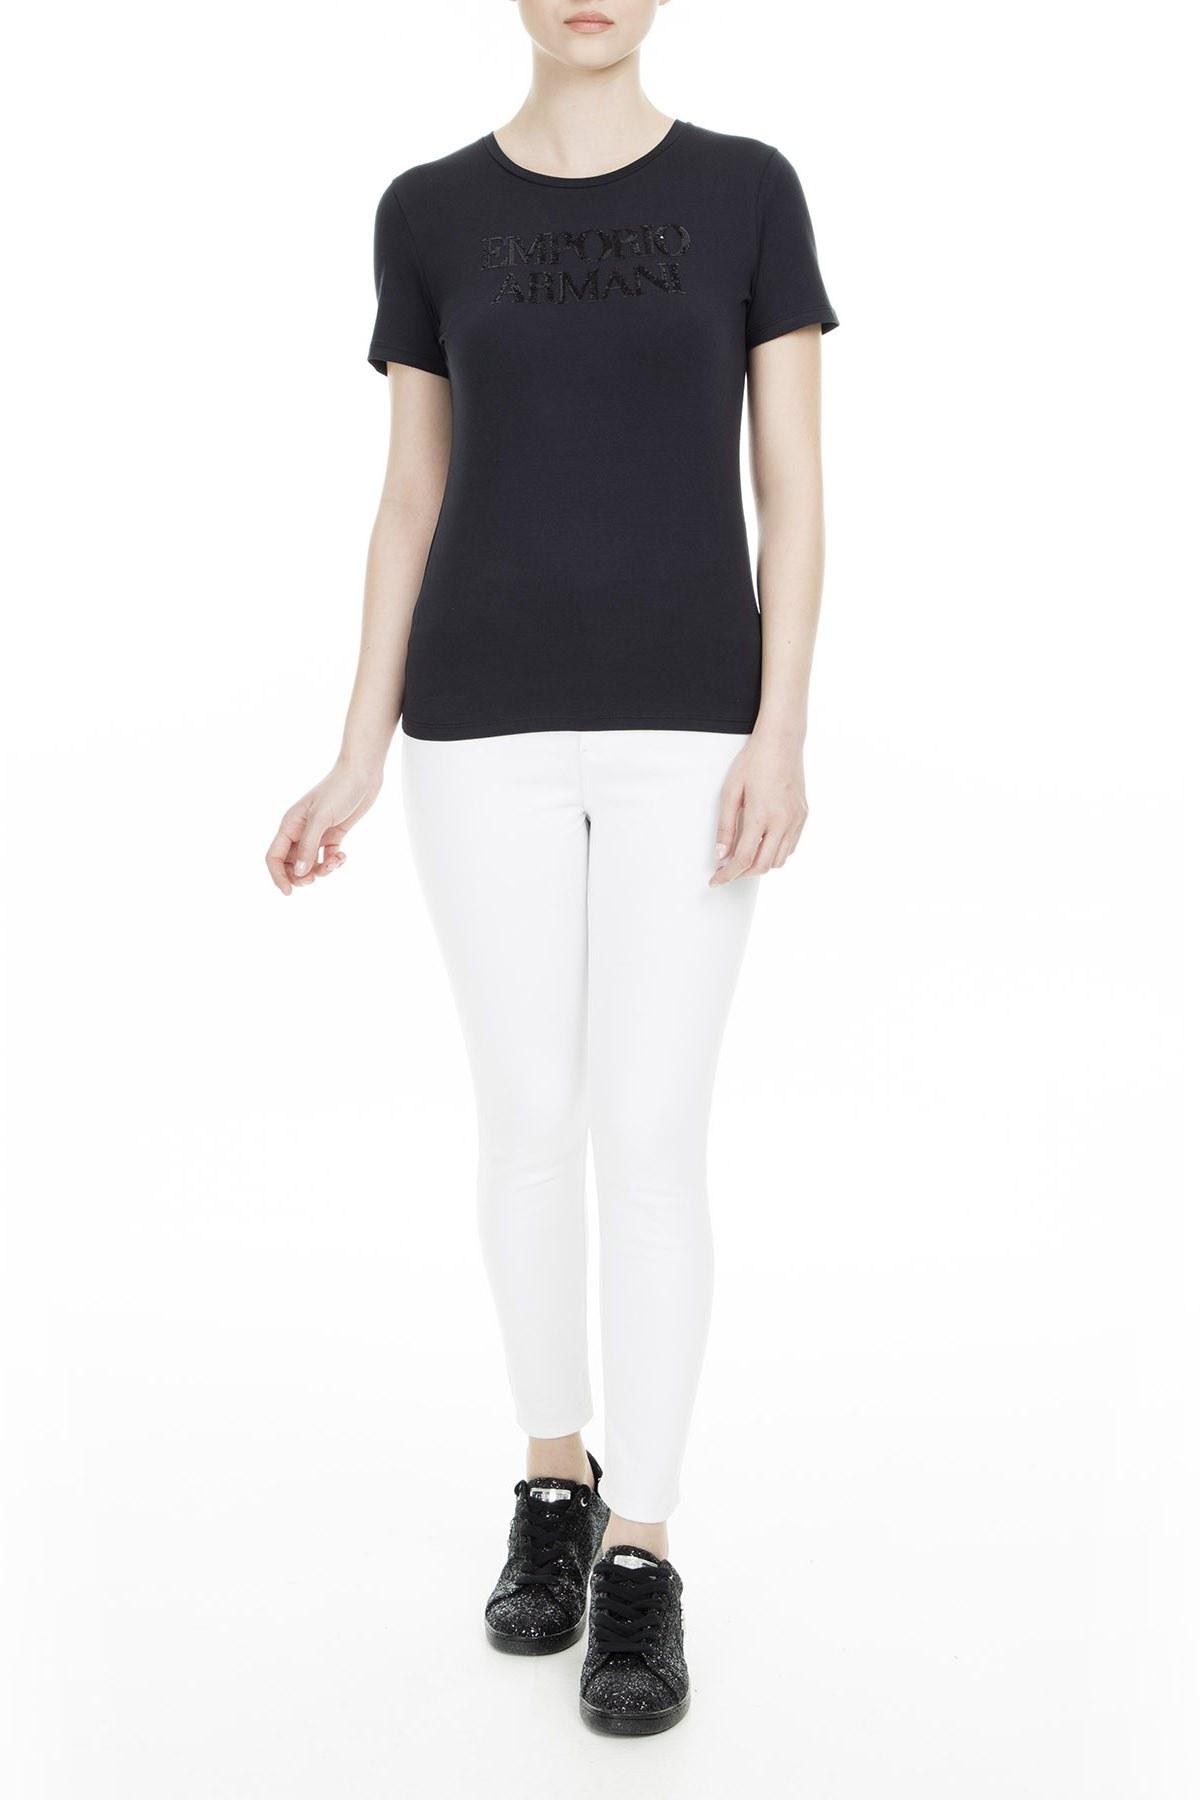 Emporio Armani Kadın T Shirt S 3G2T86 2JQAZ 0920 LACİVERT